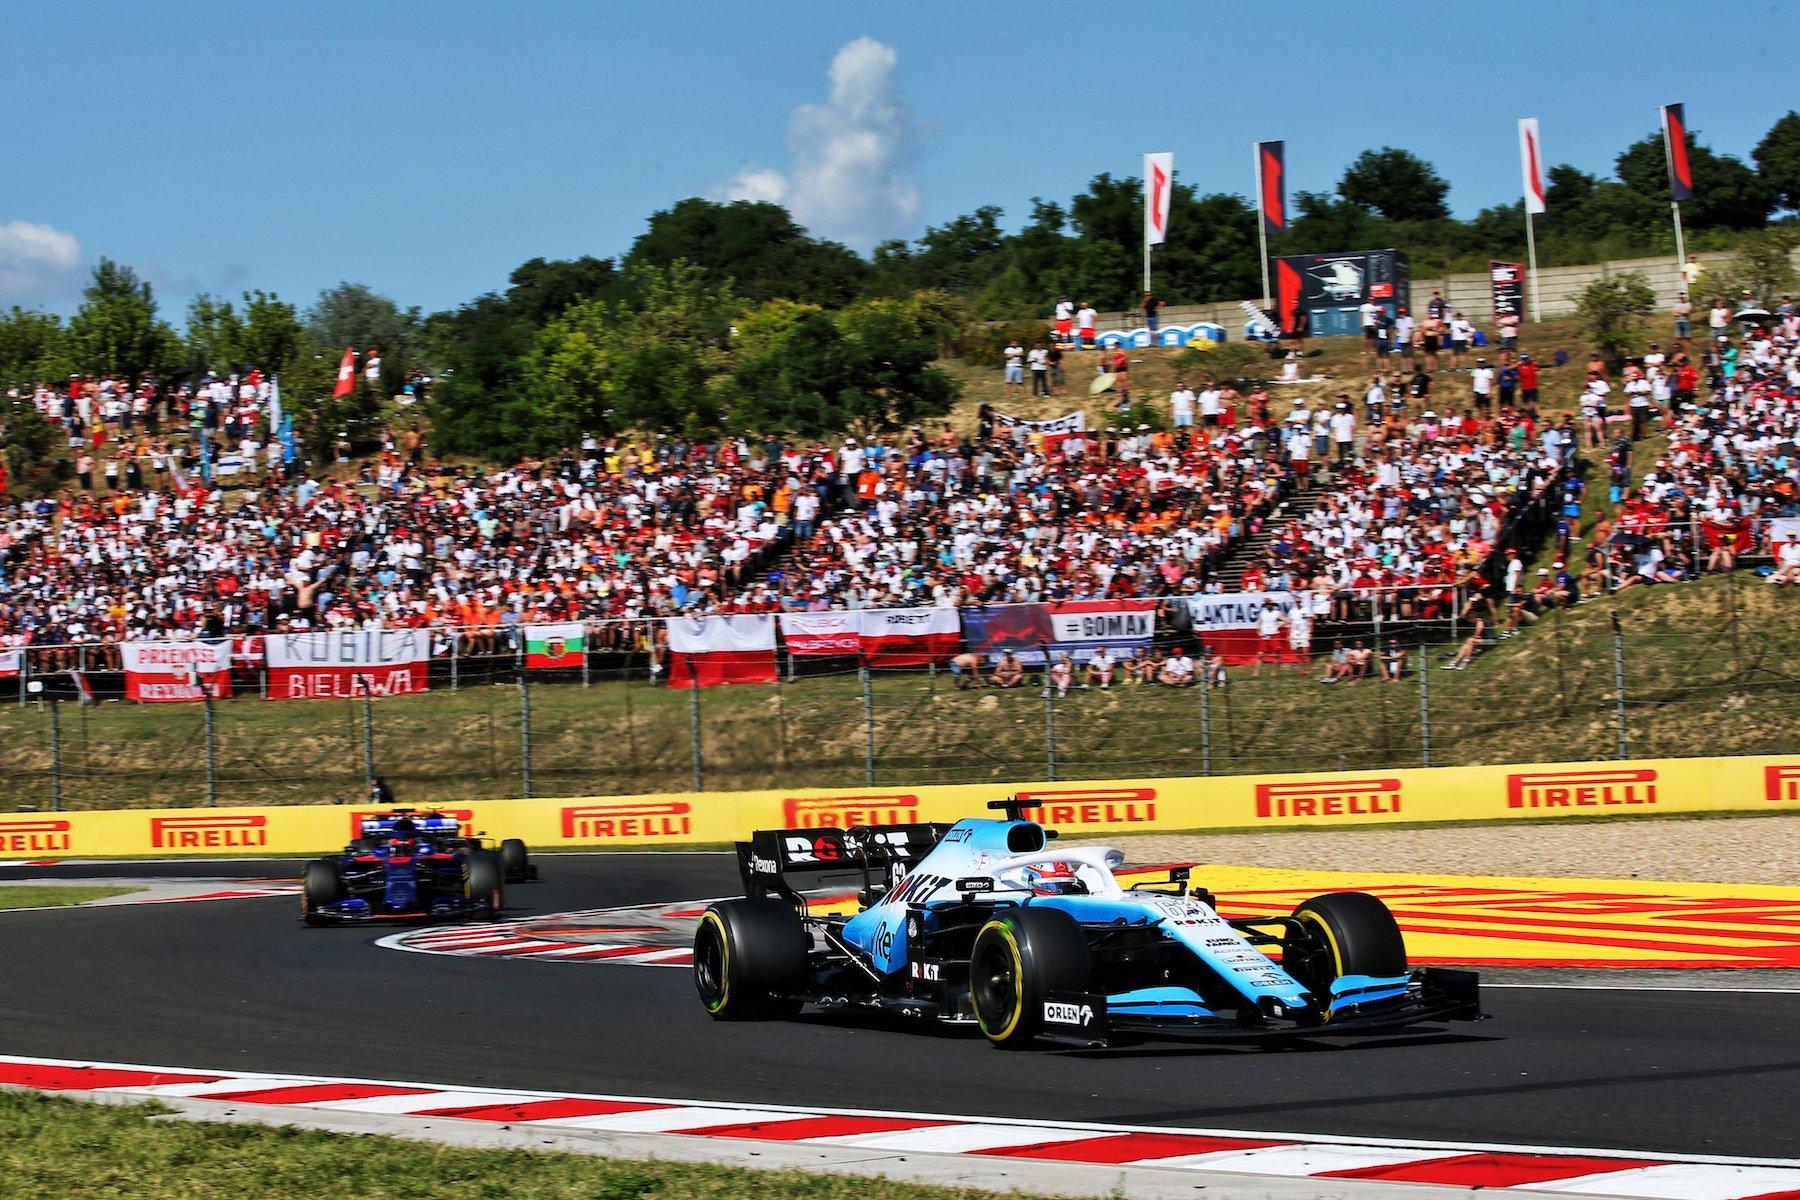 6 2019 Hungarian GP Sunday 69.jpg